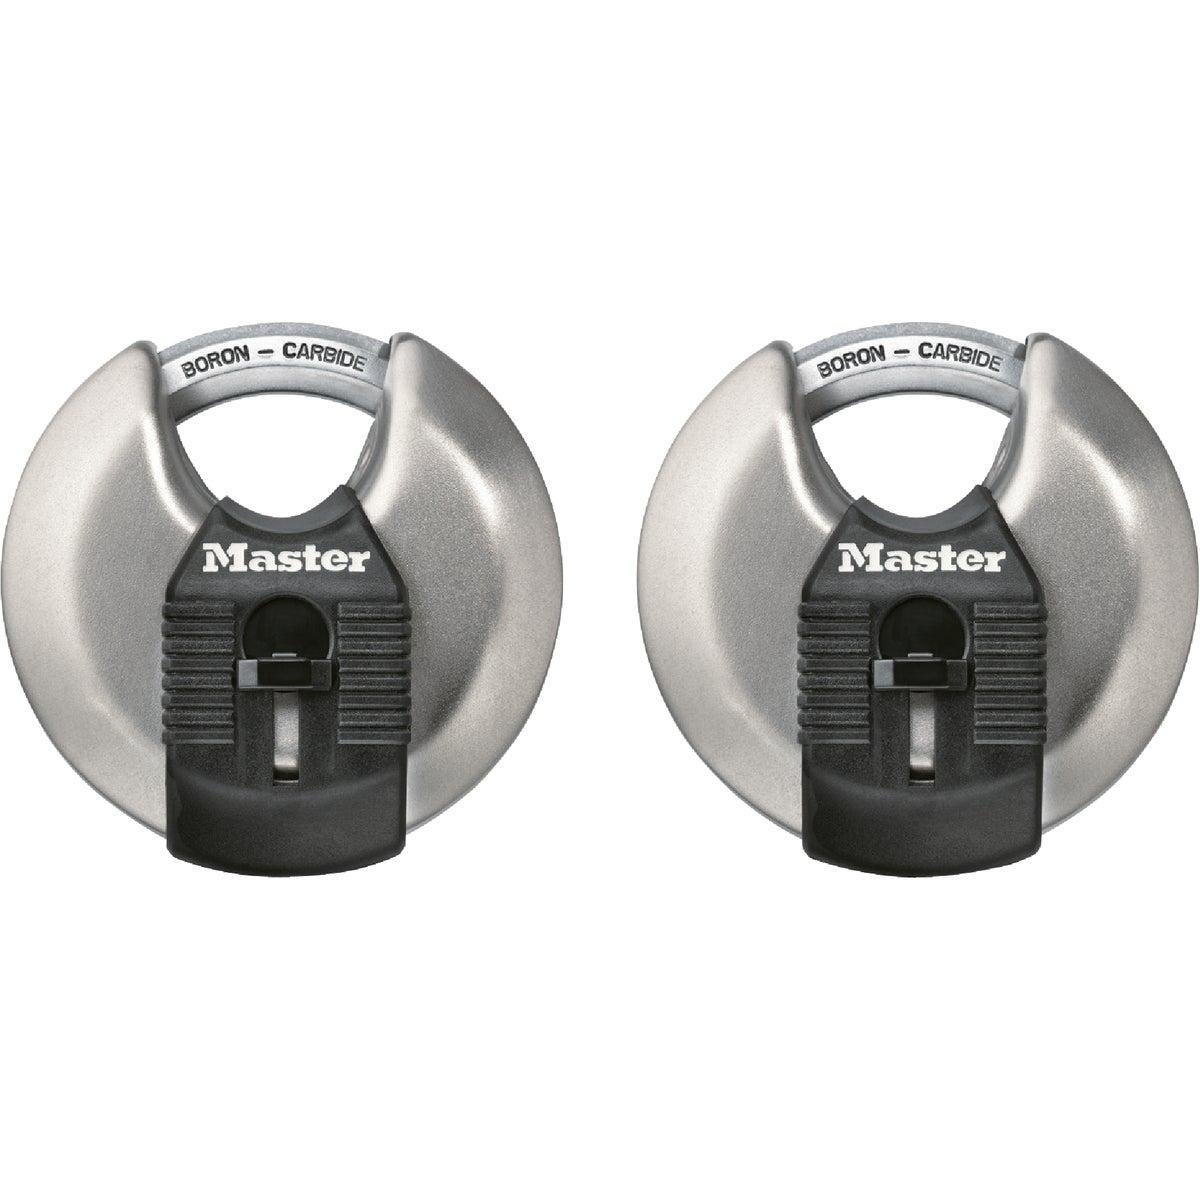 2PK MAG DISCUS PADLOCK - M40XT by Master Lock Company